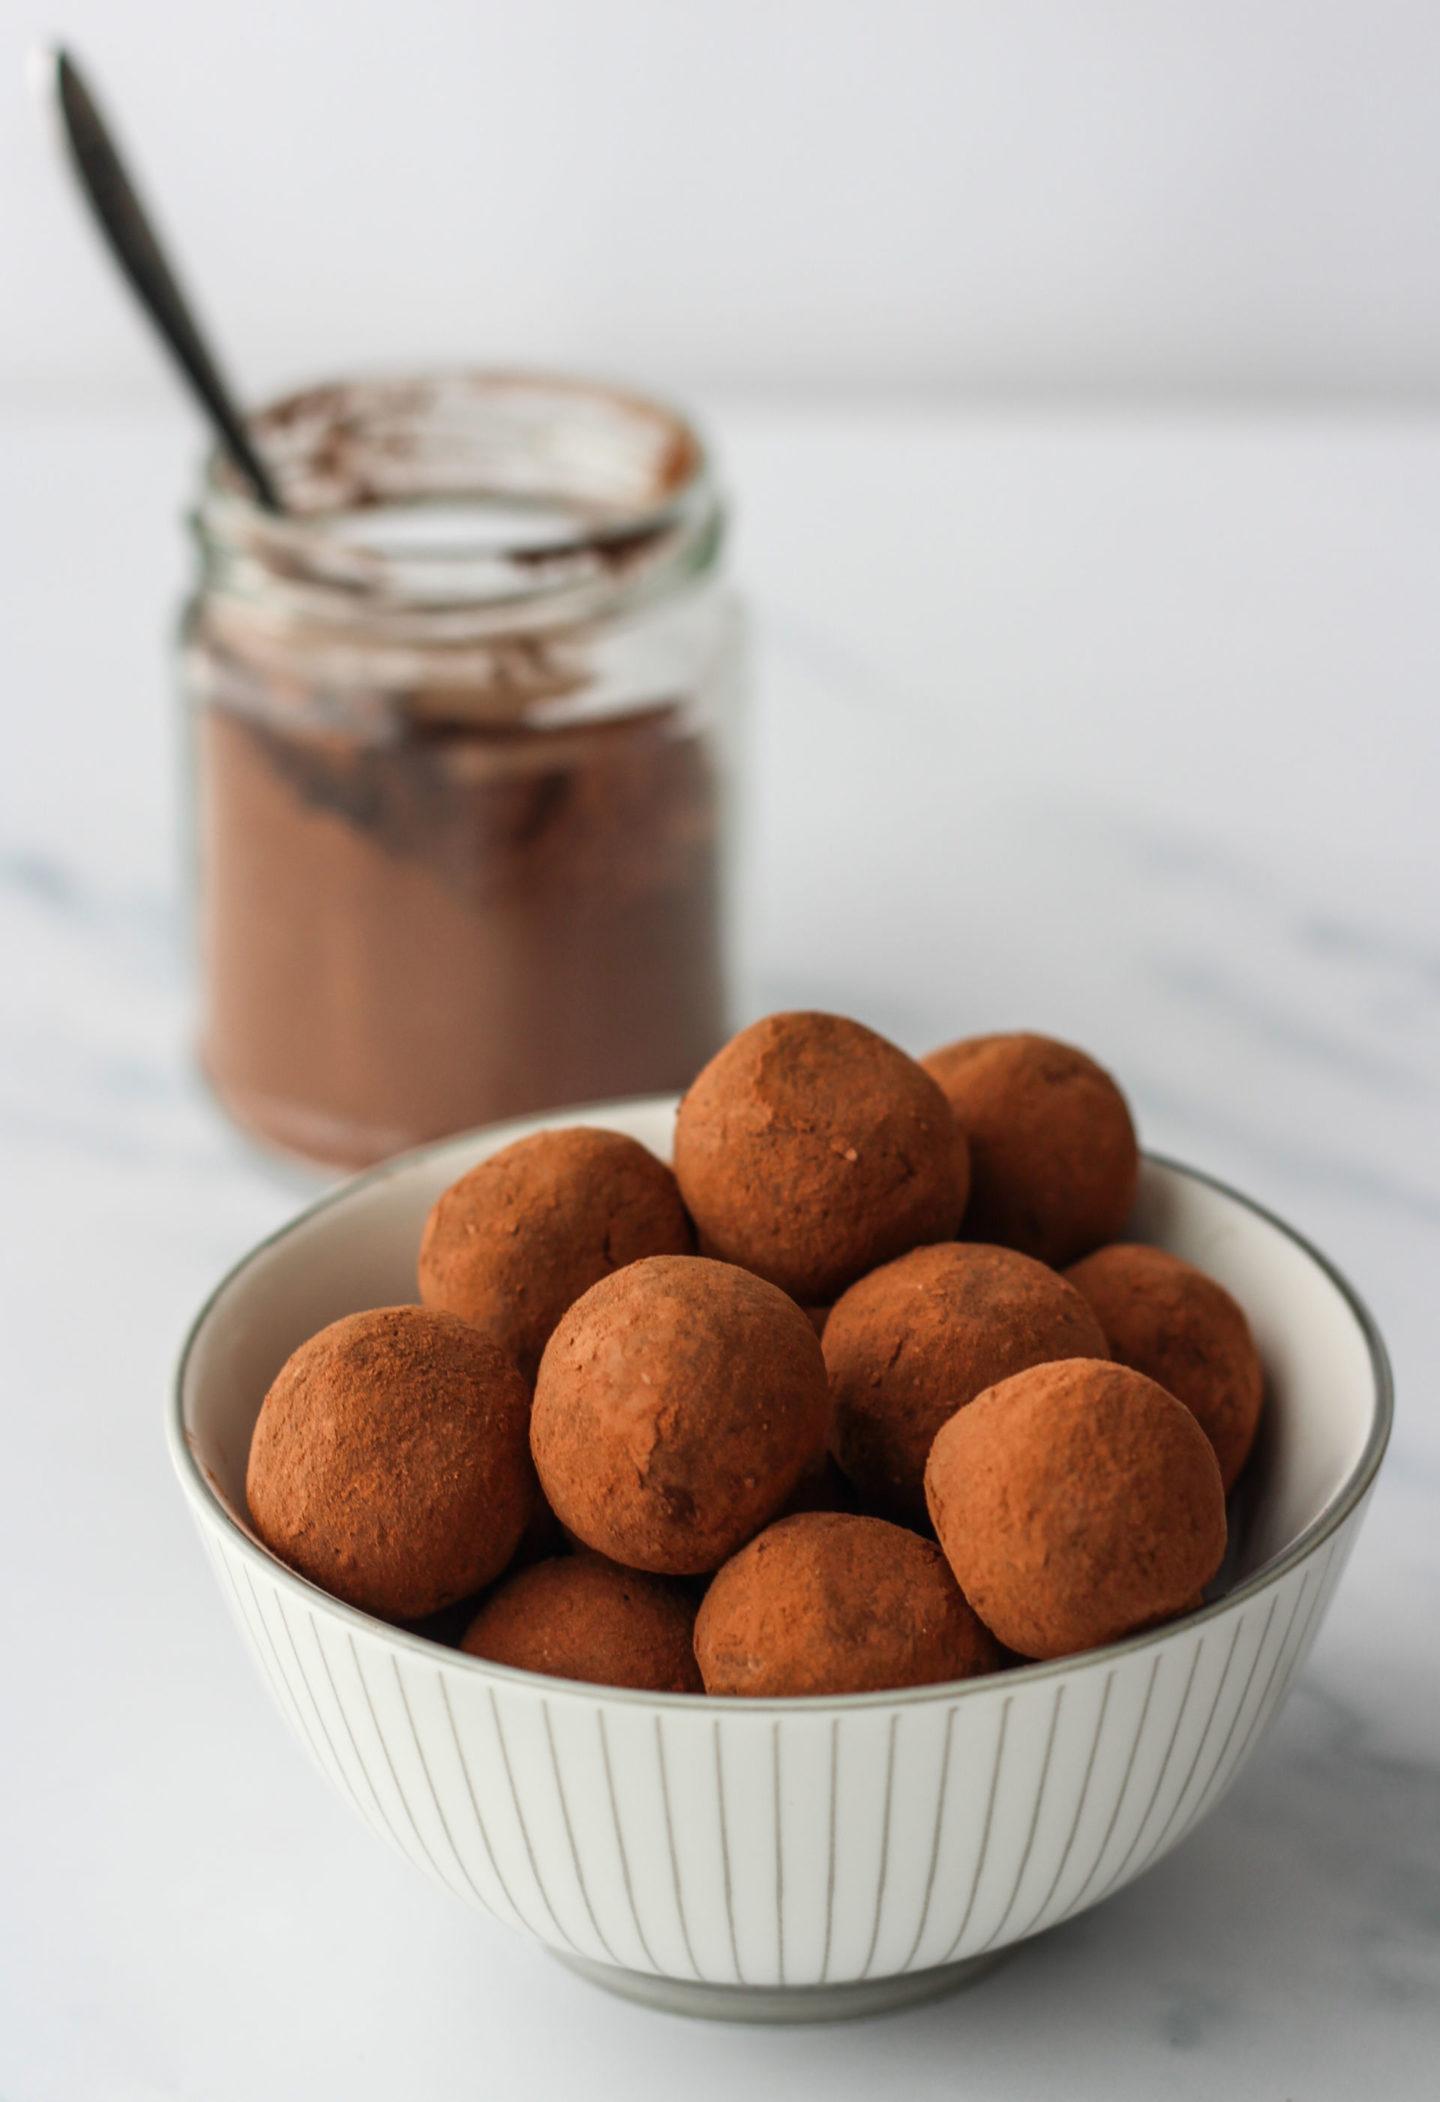 bowl of whole truffles